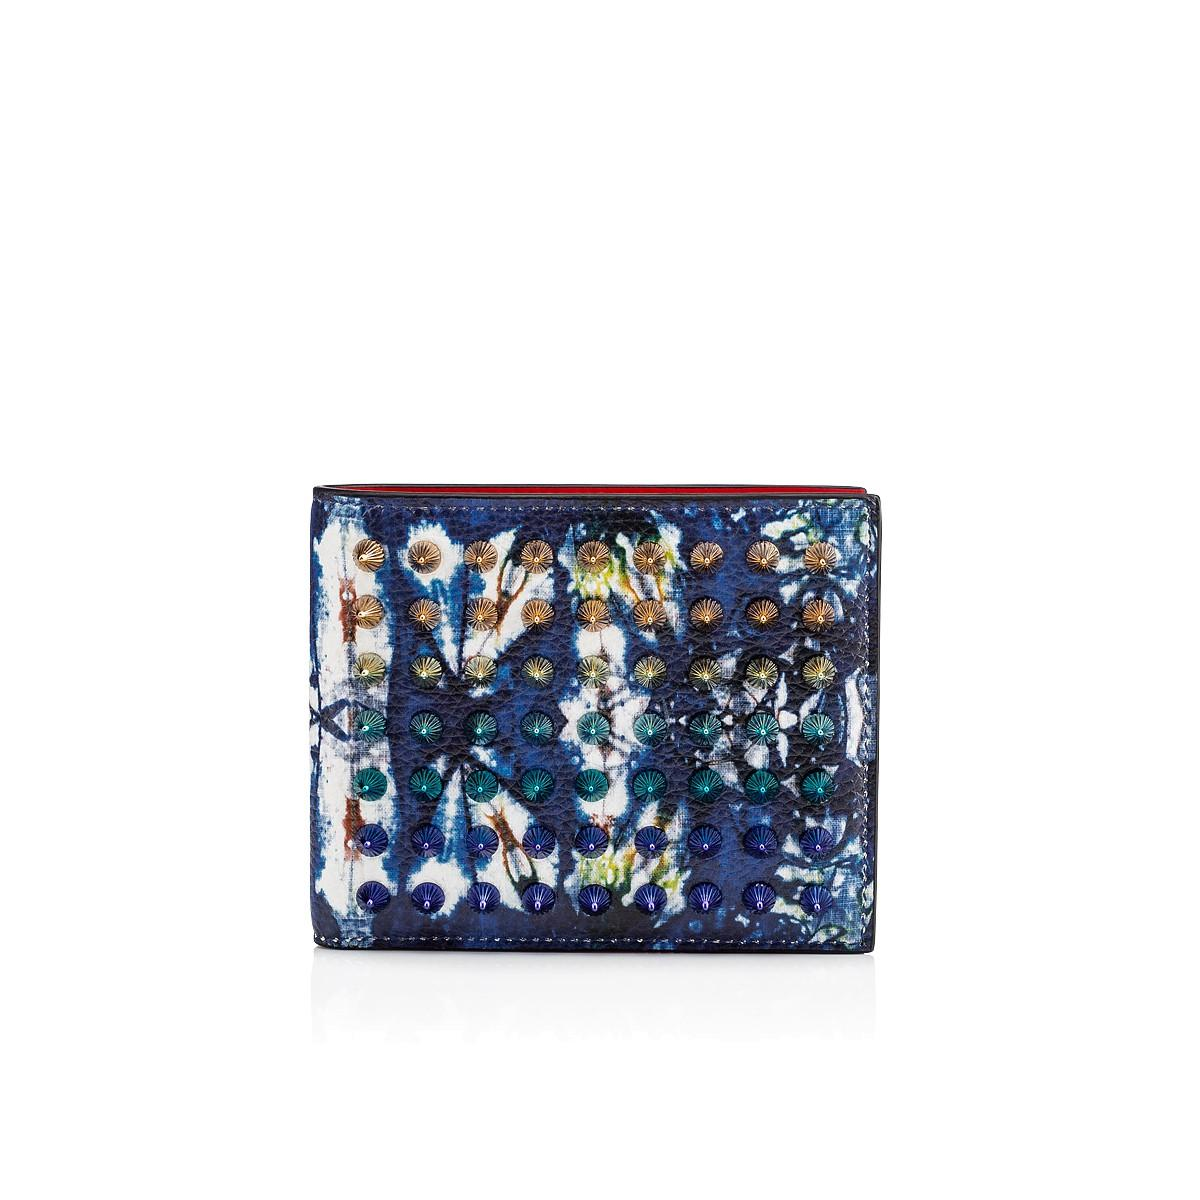 Christian Louboutin Coolcoin Wallet In Blue